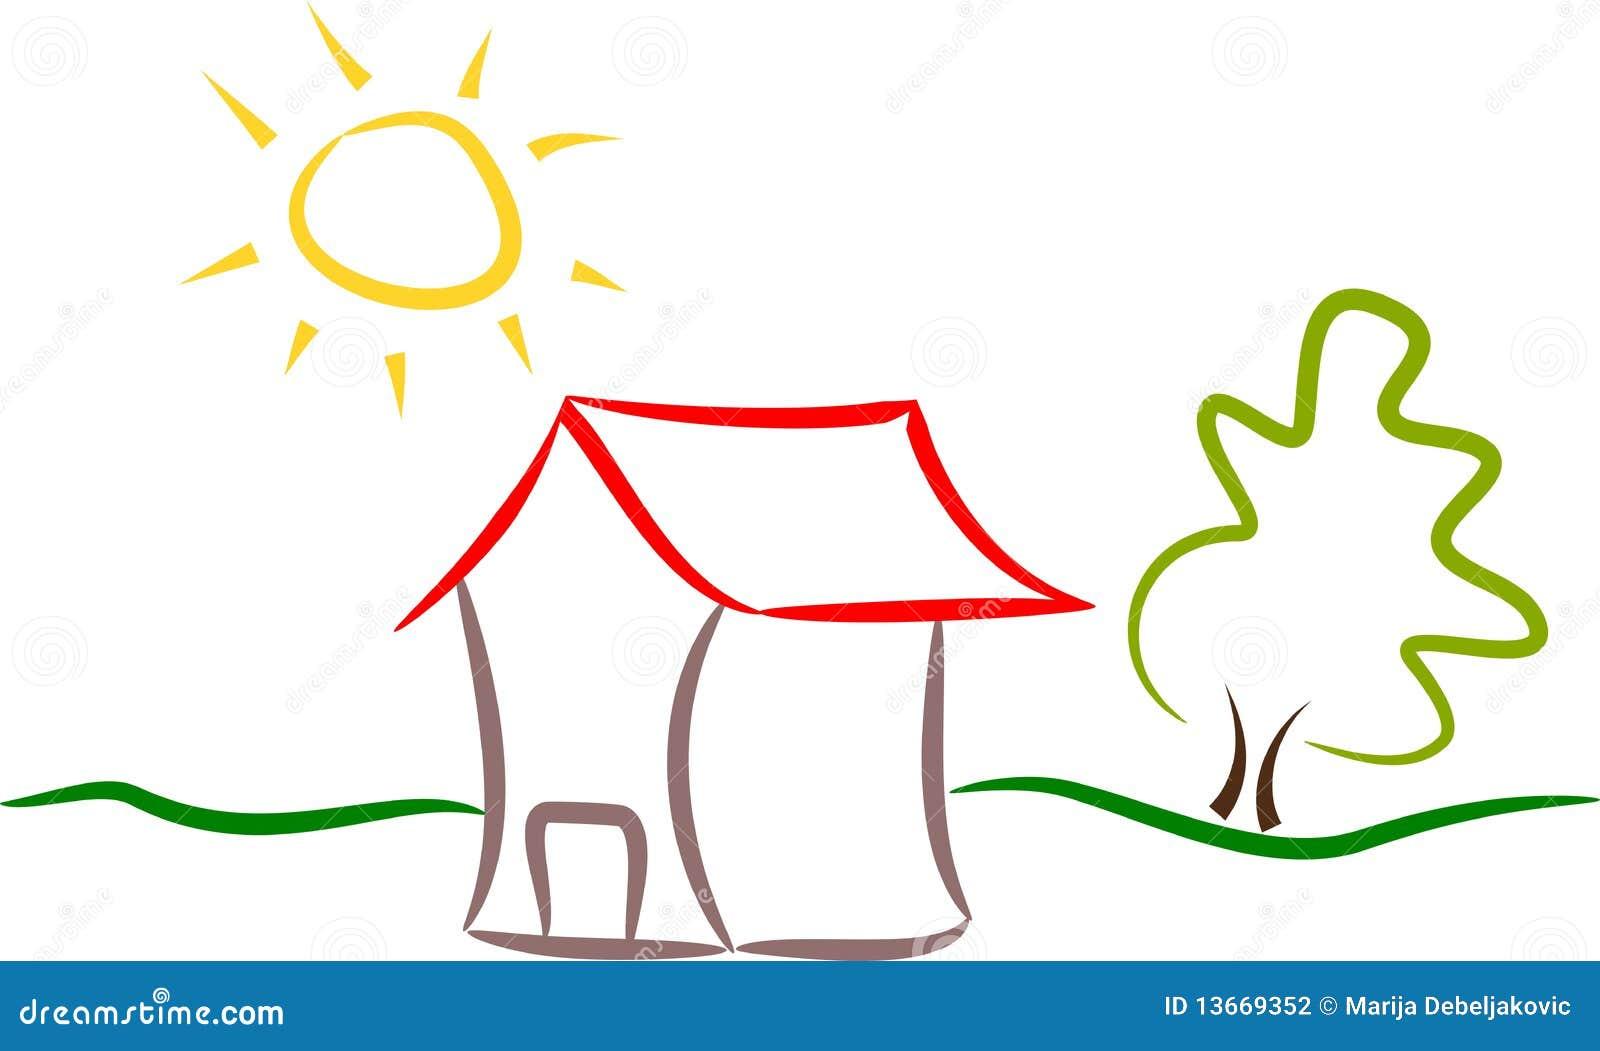 abstract house logo stock illustration image of drawing house illustration etsy house illustration etsy